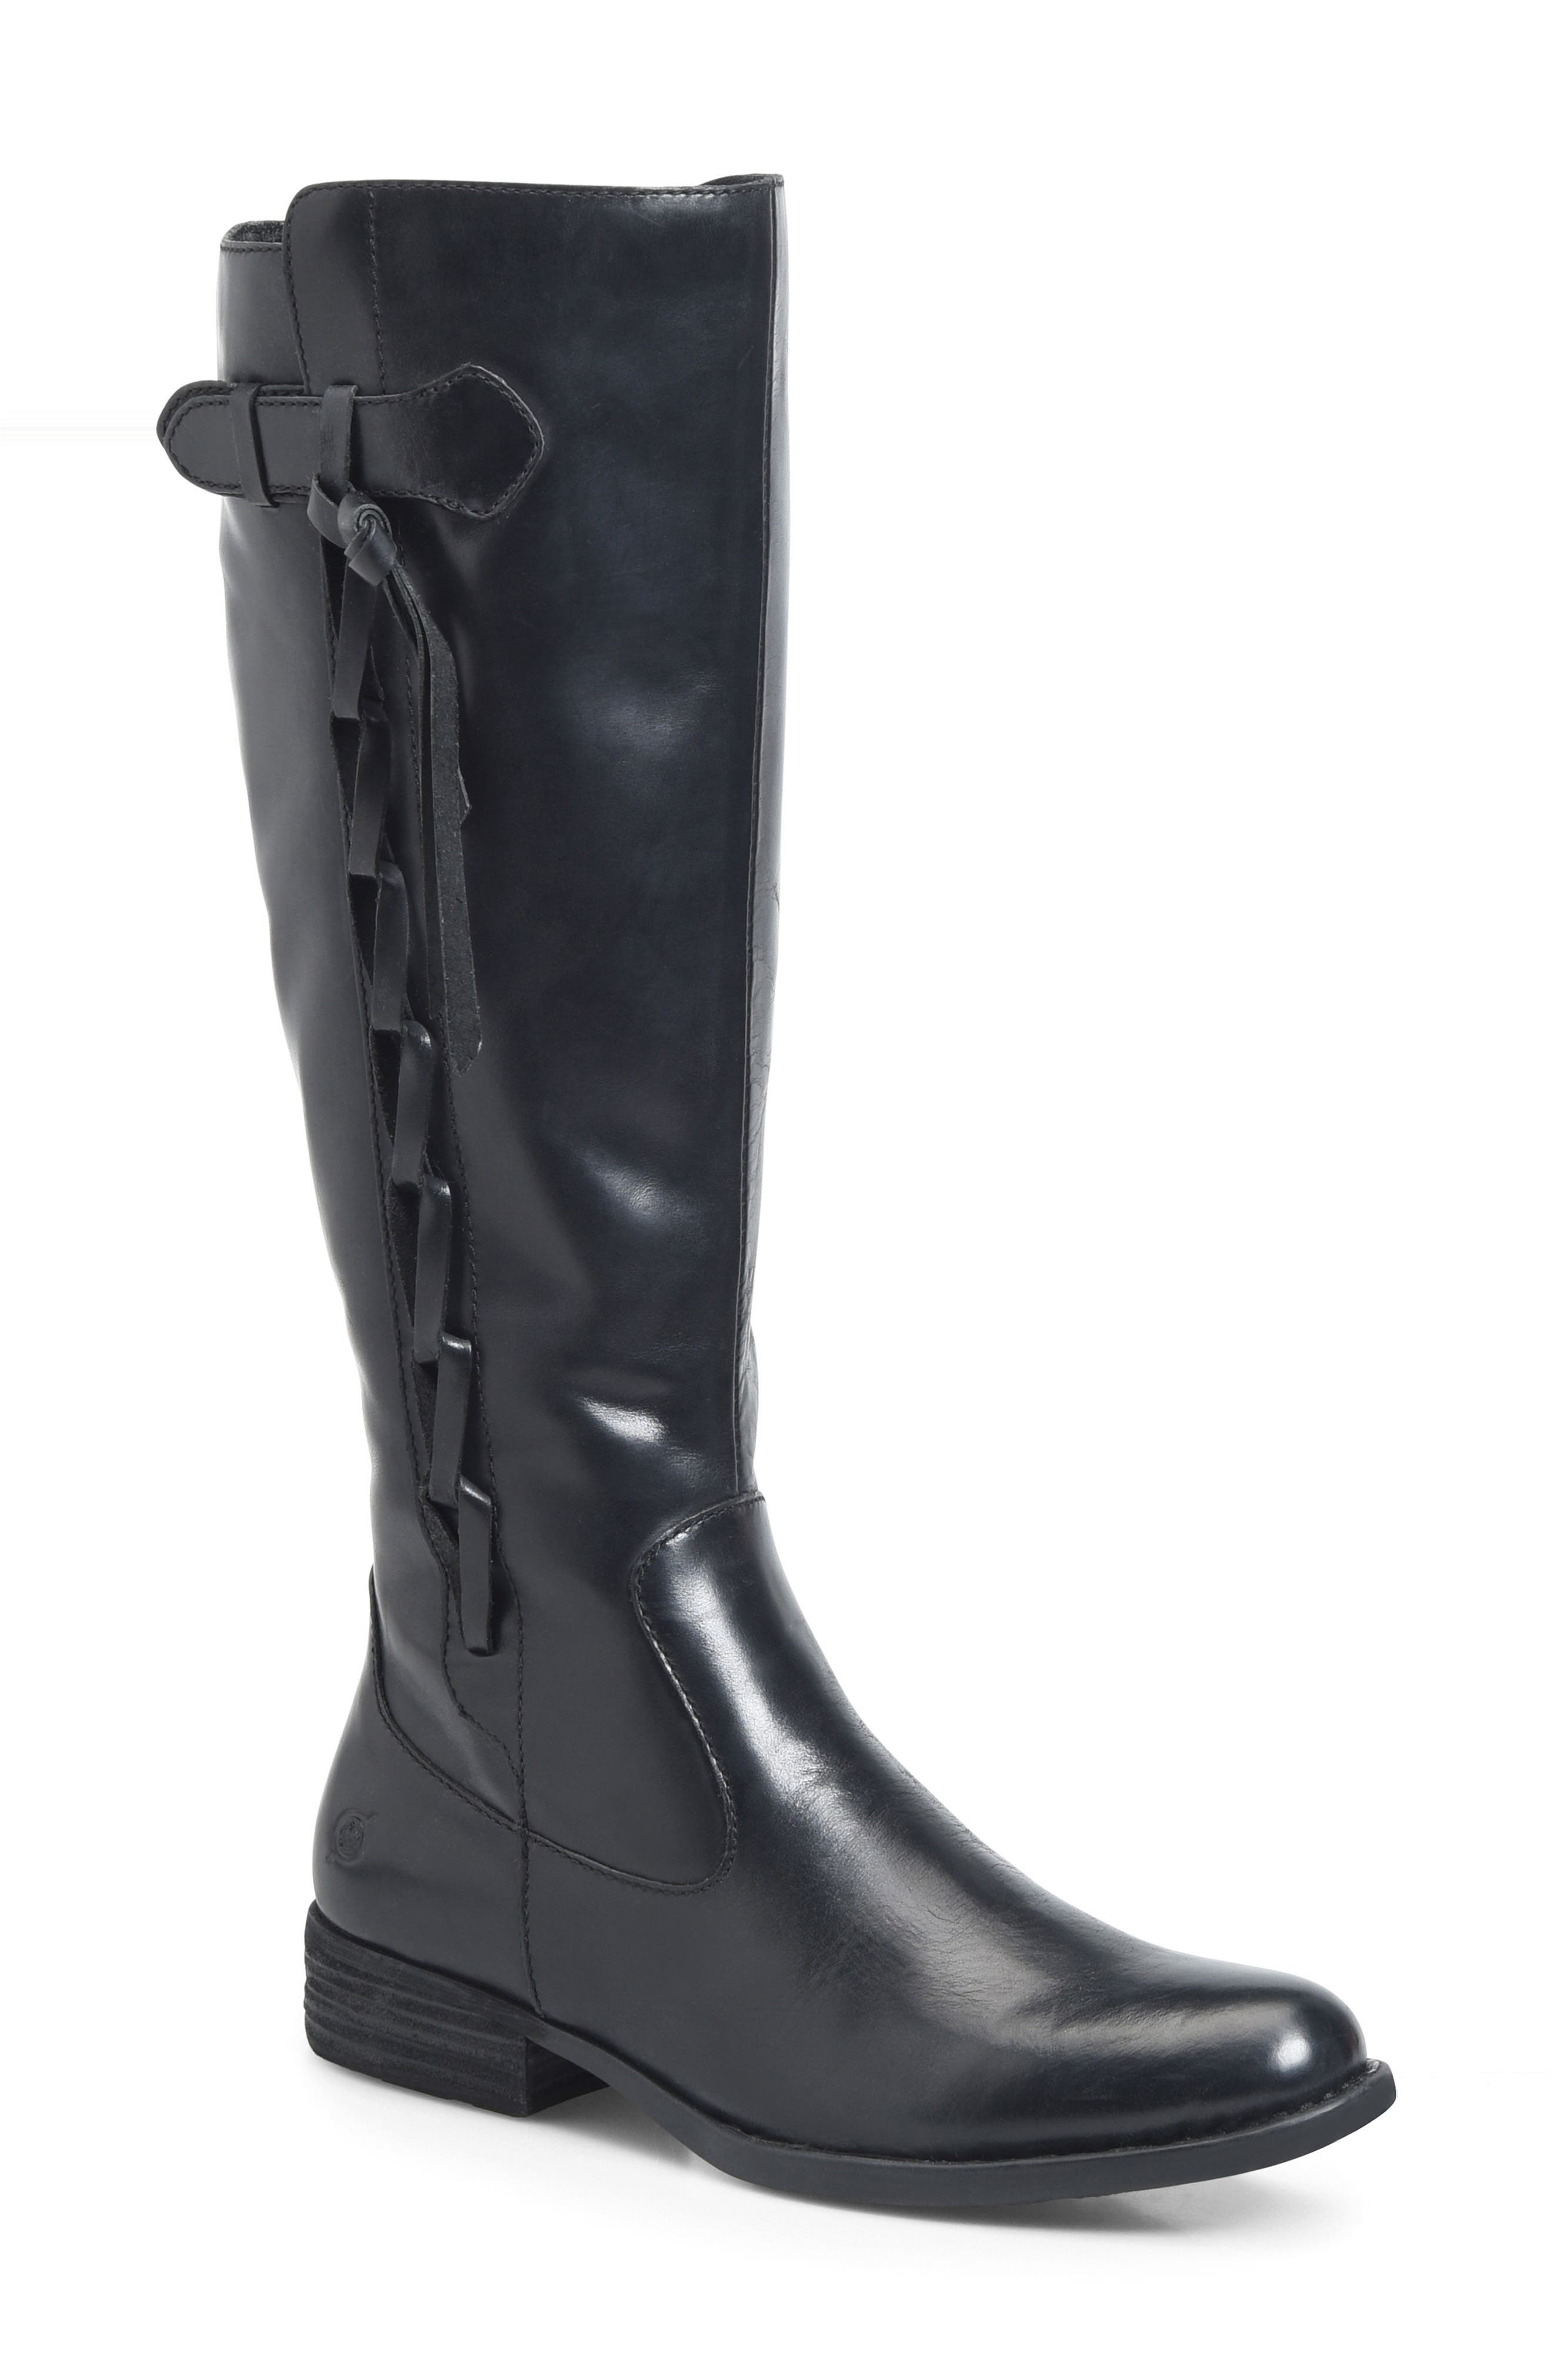 Alternate Image 1 Selected - Børn Cook Knee High Boot (Women)